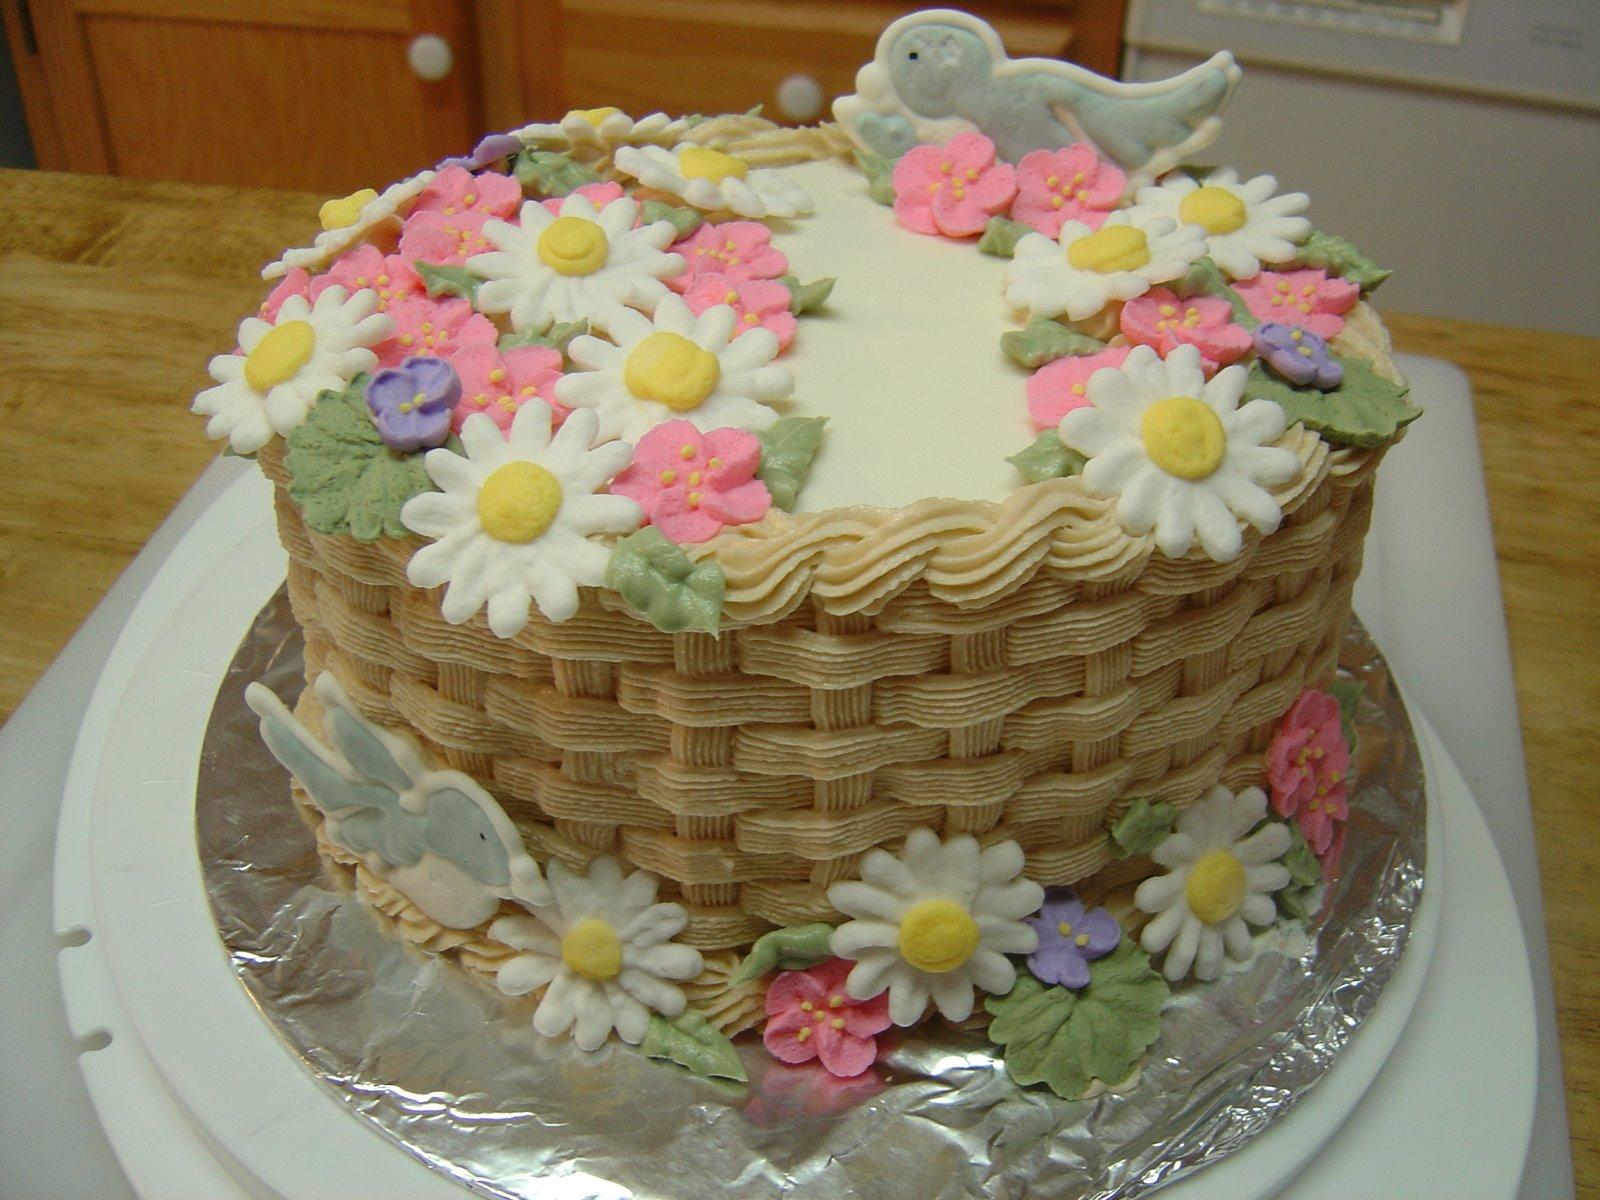 Best Finale Cakes